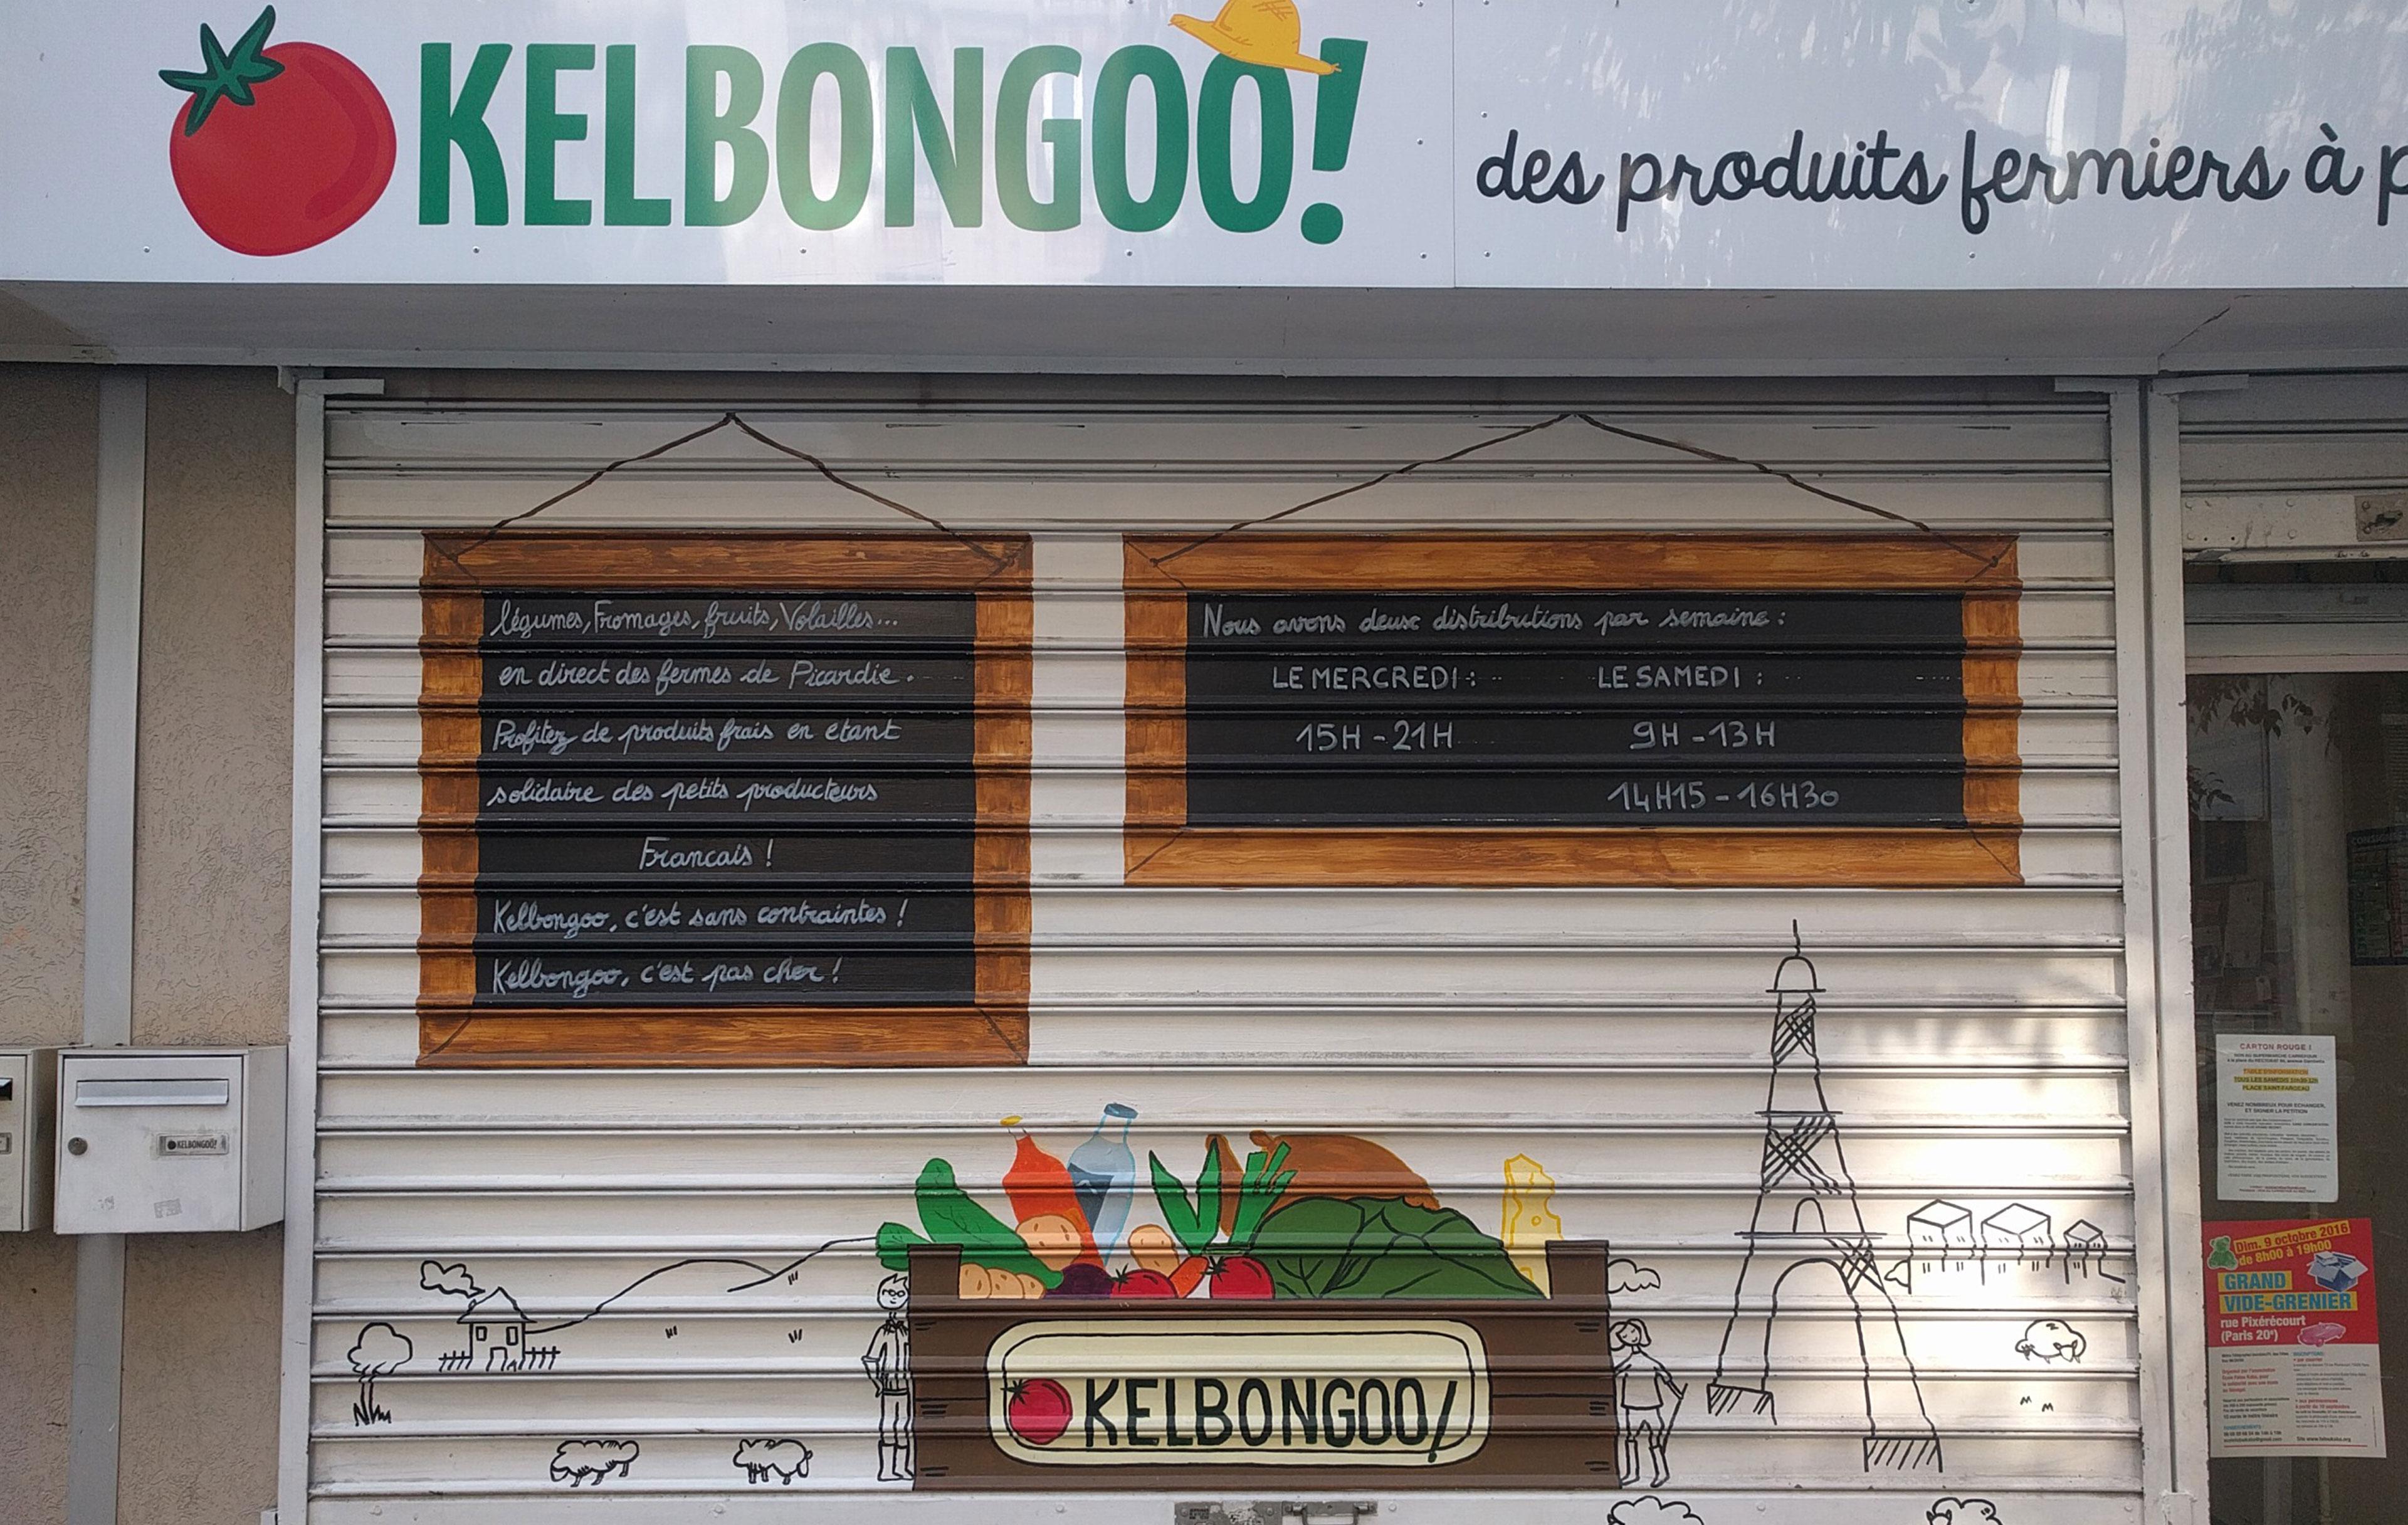 Kelbongoo - Produits fermiers à petits prix